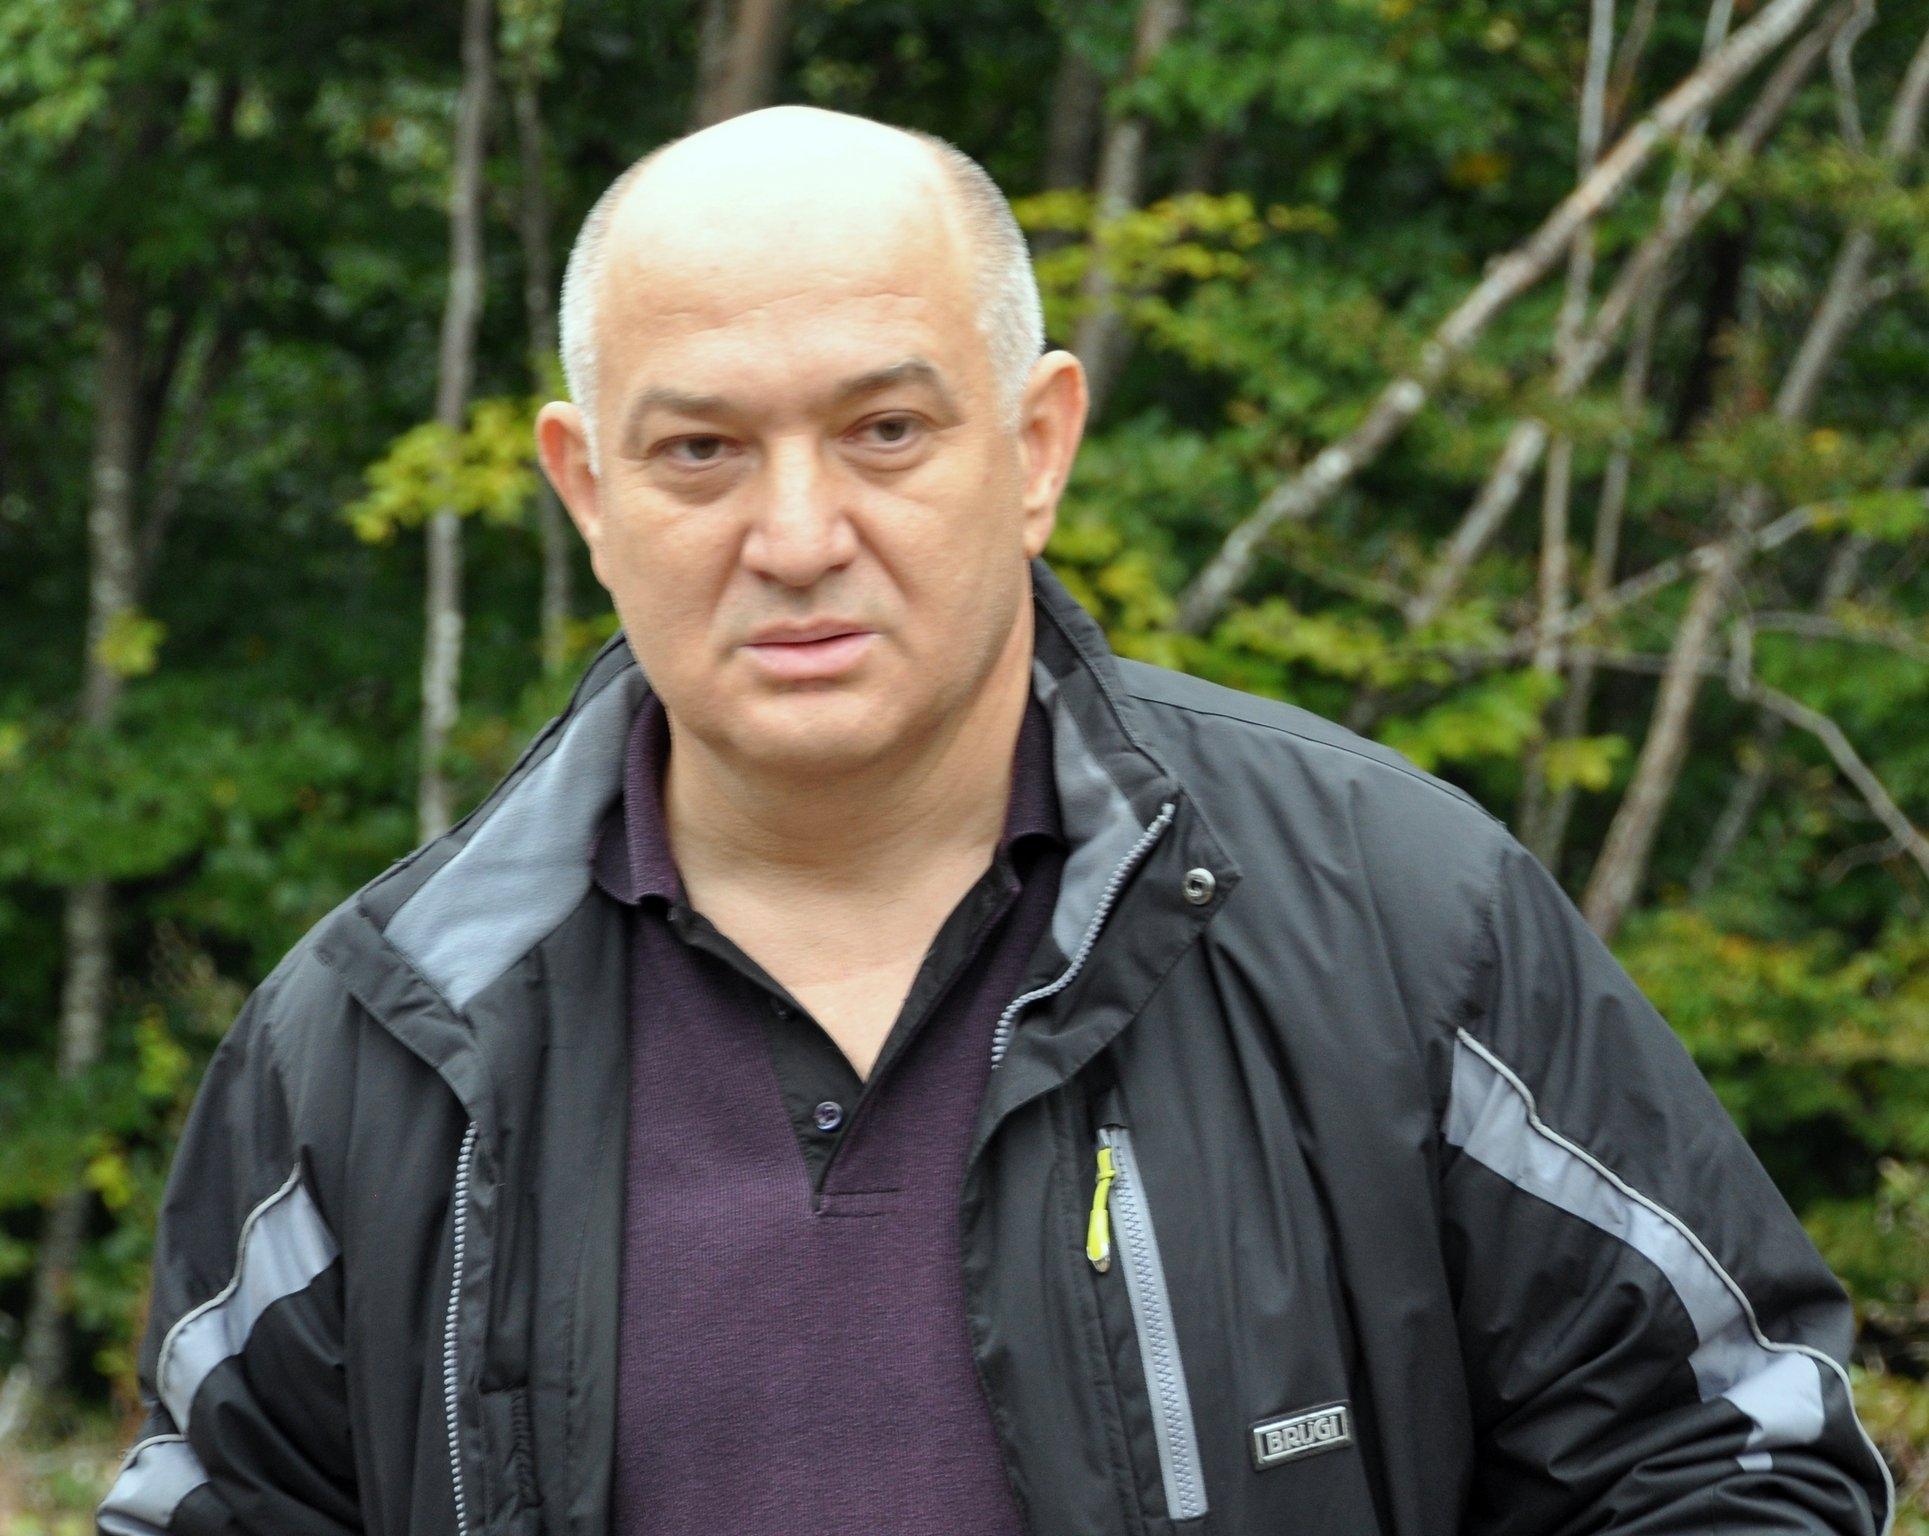 Ranko Vujacic